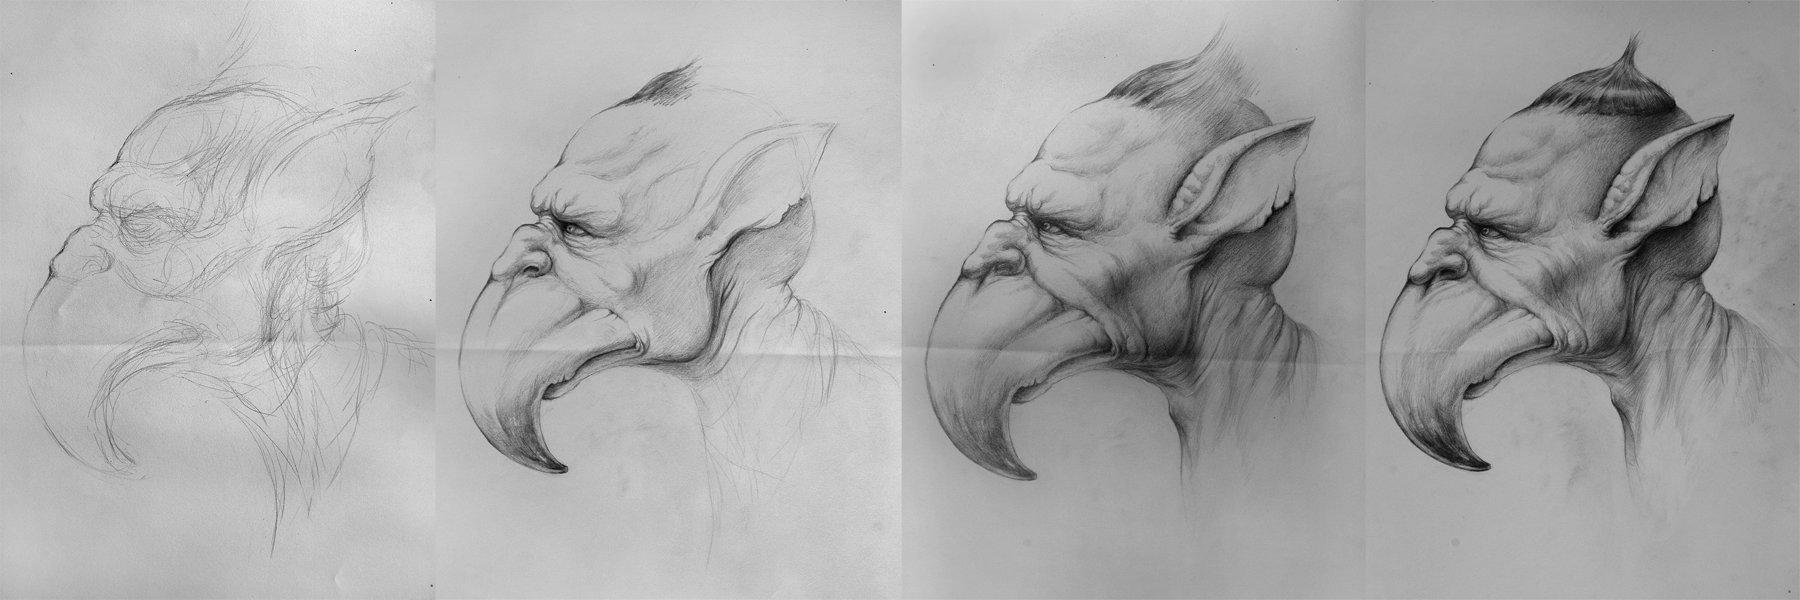 progress of sketching